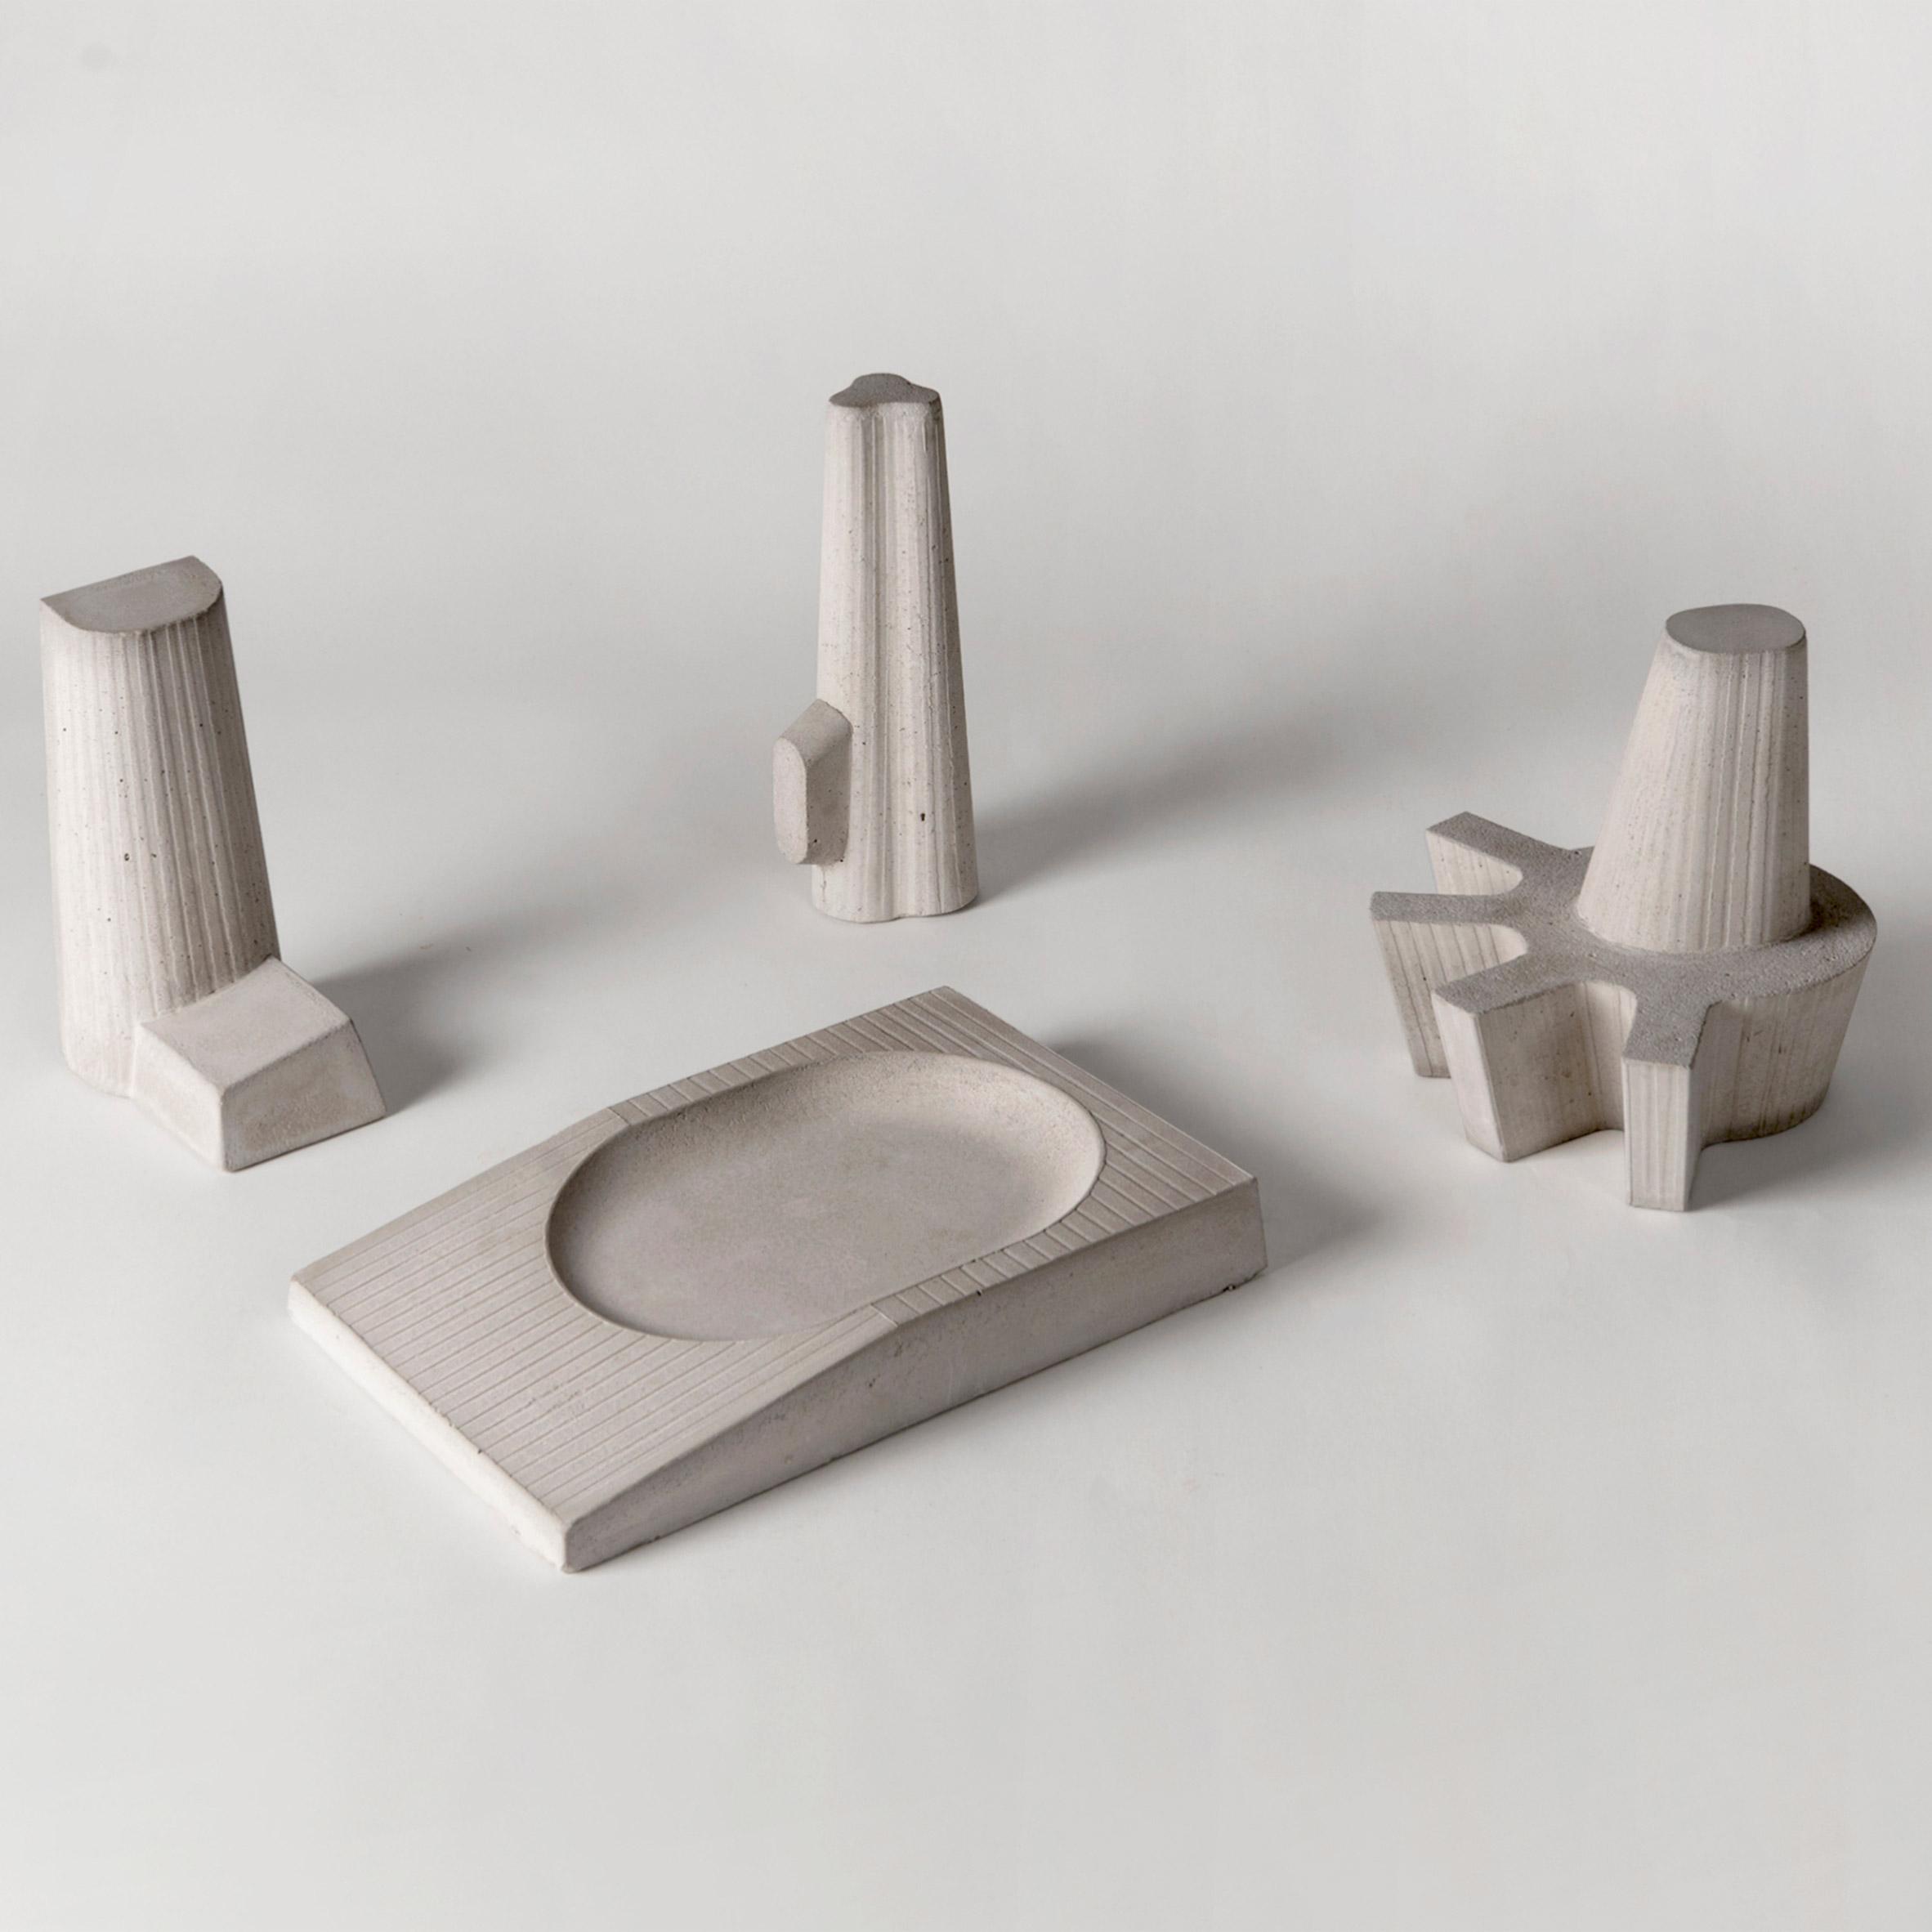 Liliana Ovalle creates mini concrete sculptures based on brutalist buildings